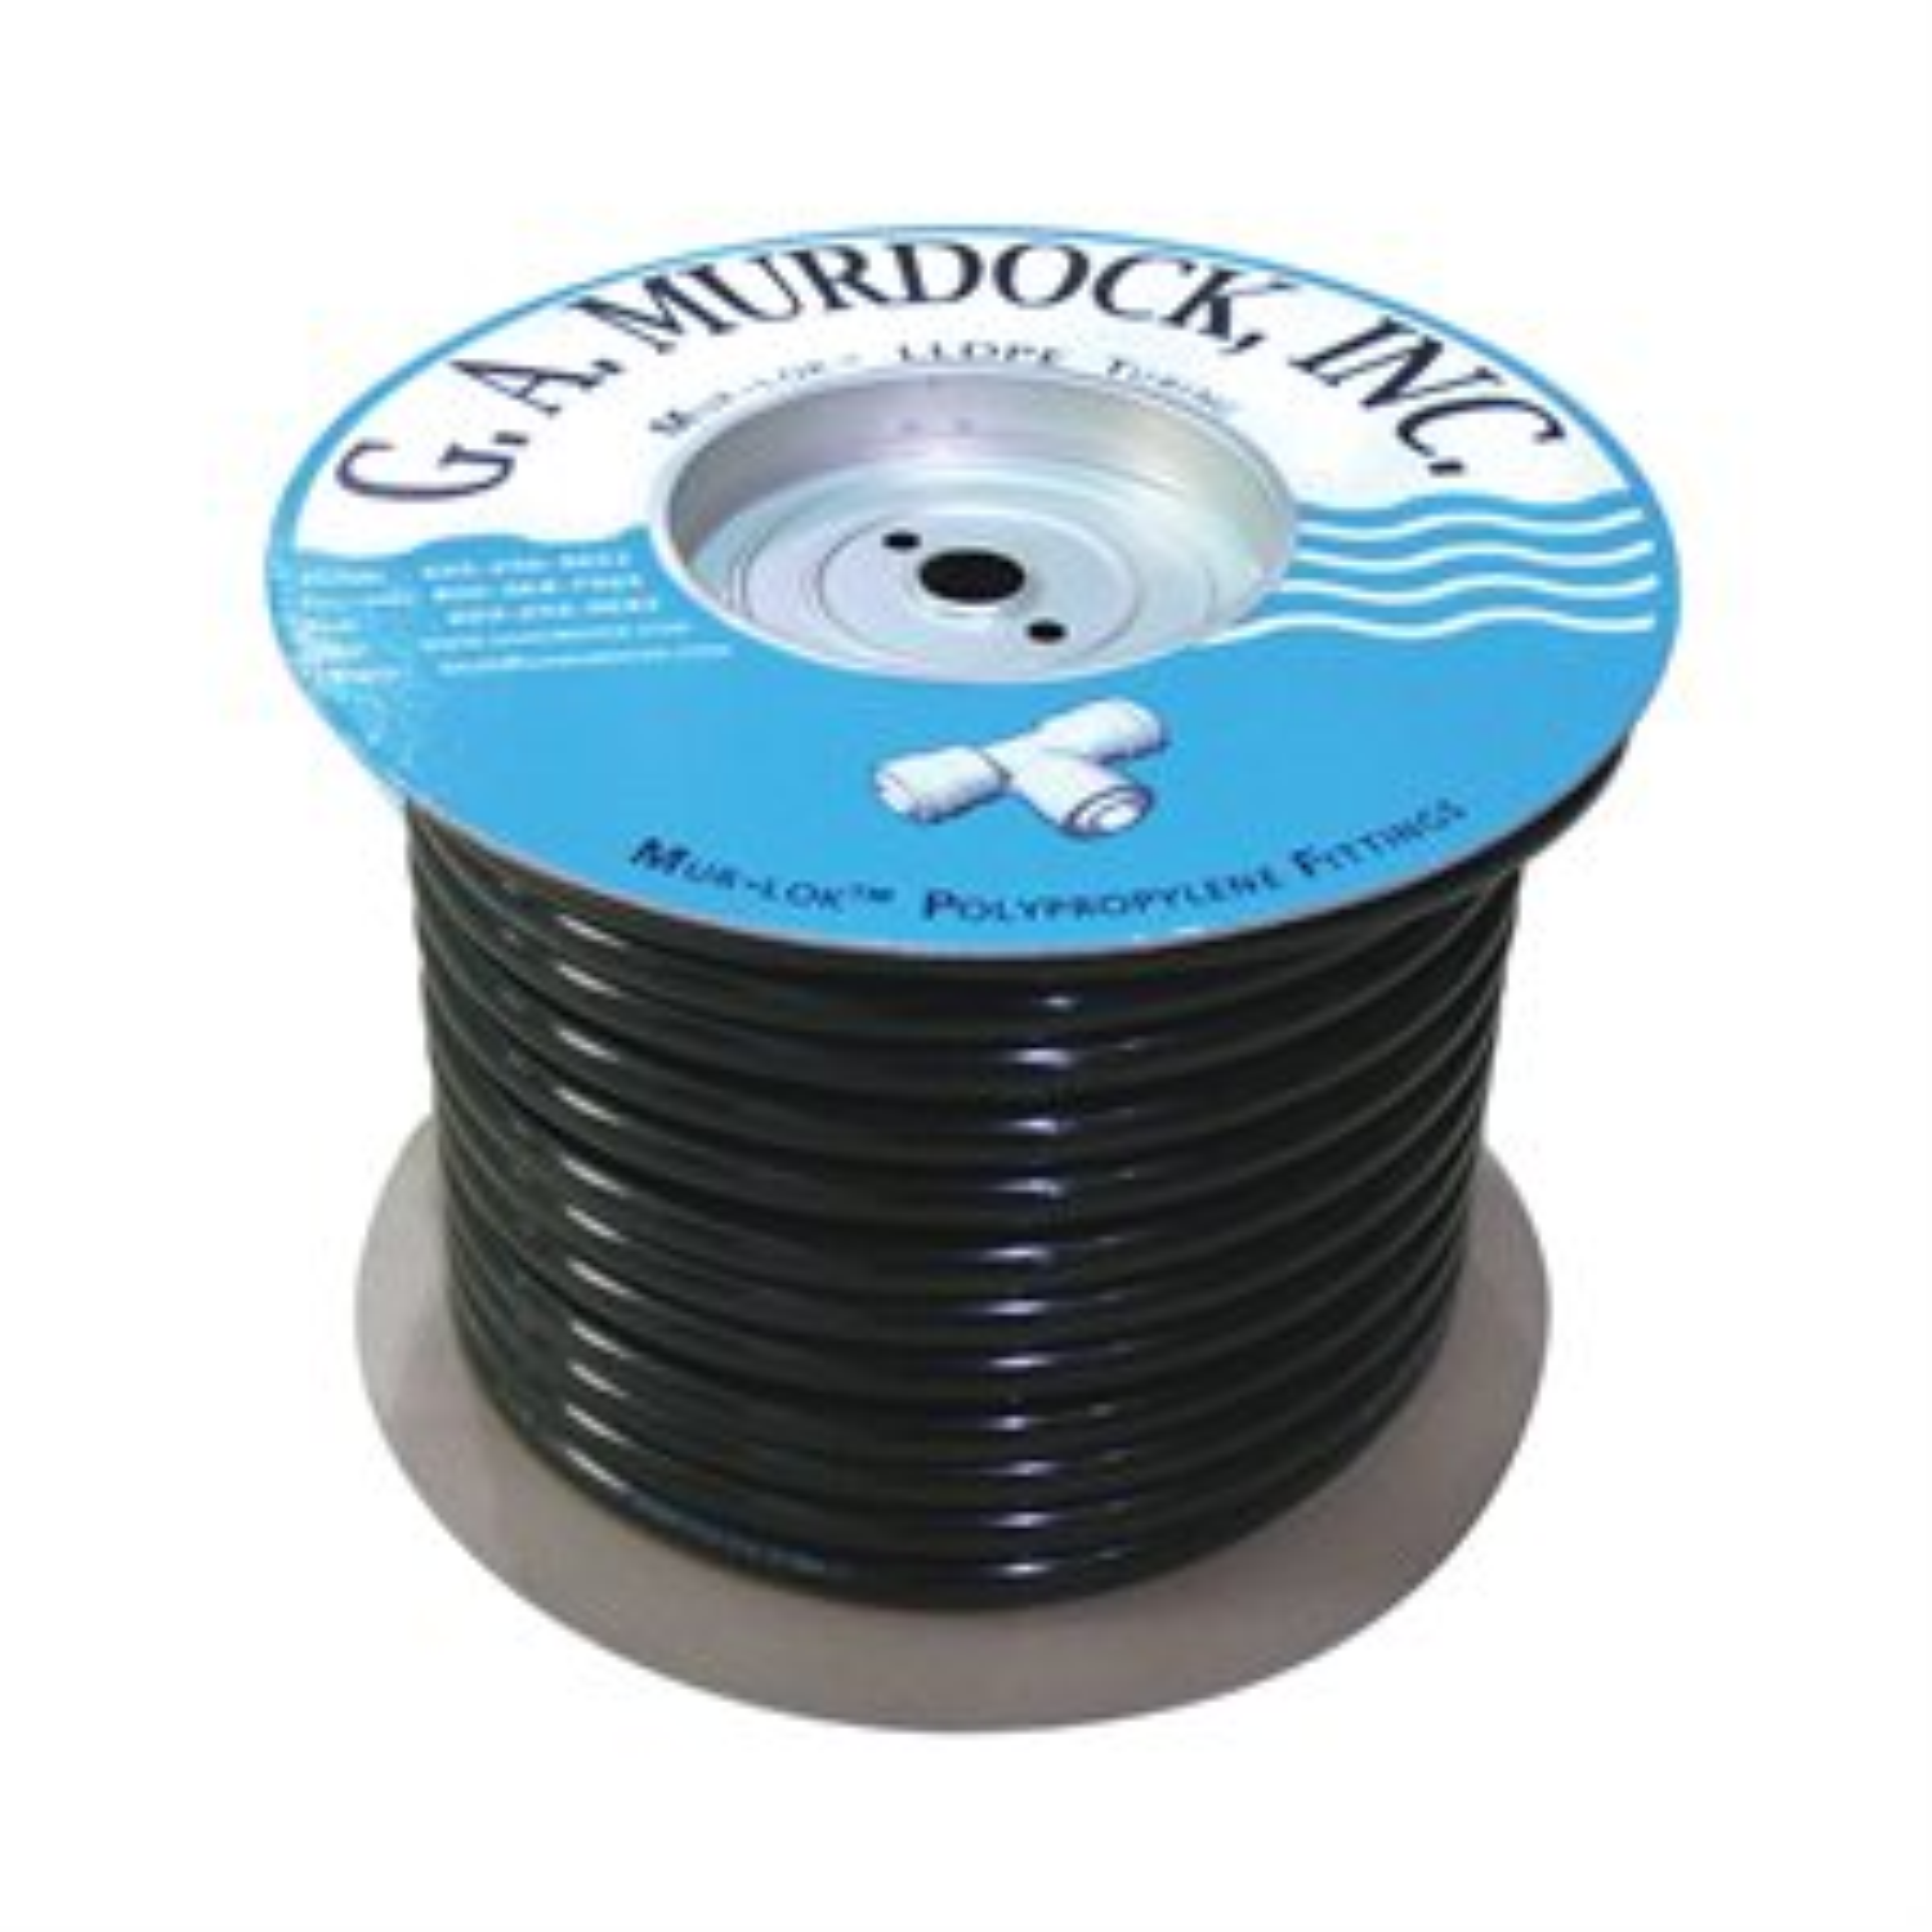 "3/4"" x 5/8"" 100' Mur-lok LLDPE Tubing-Black"